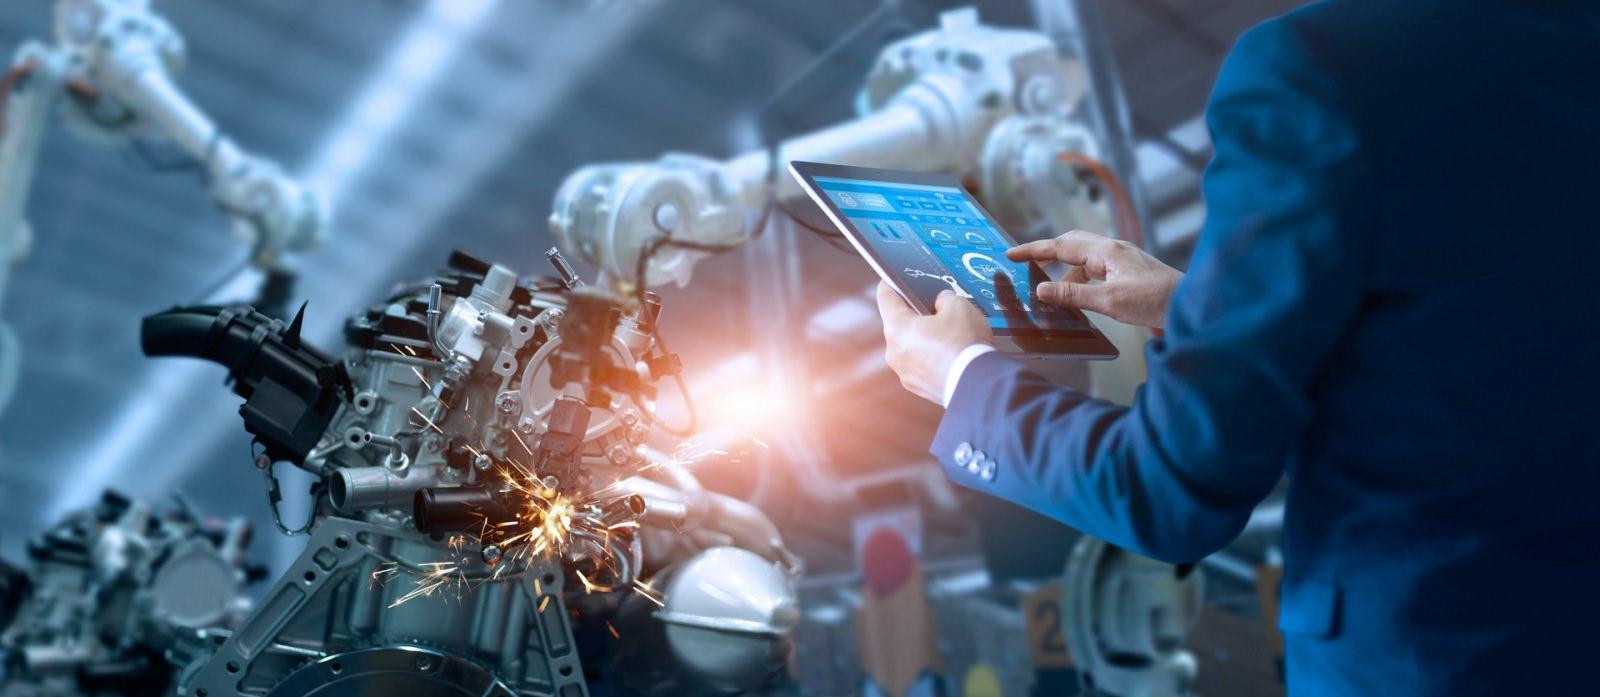 Stadler + Schaaf - Jobangebot - Ingenieur (gn*) Static & Rotating Equipment im Anlagenbau